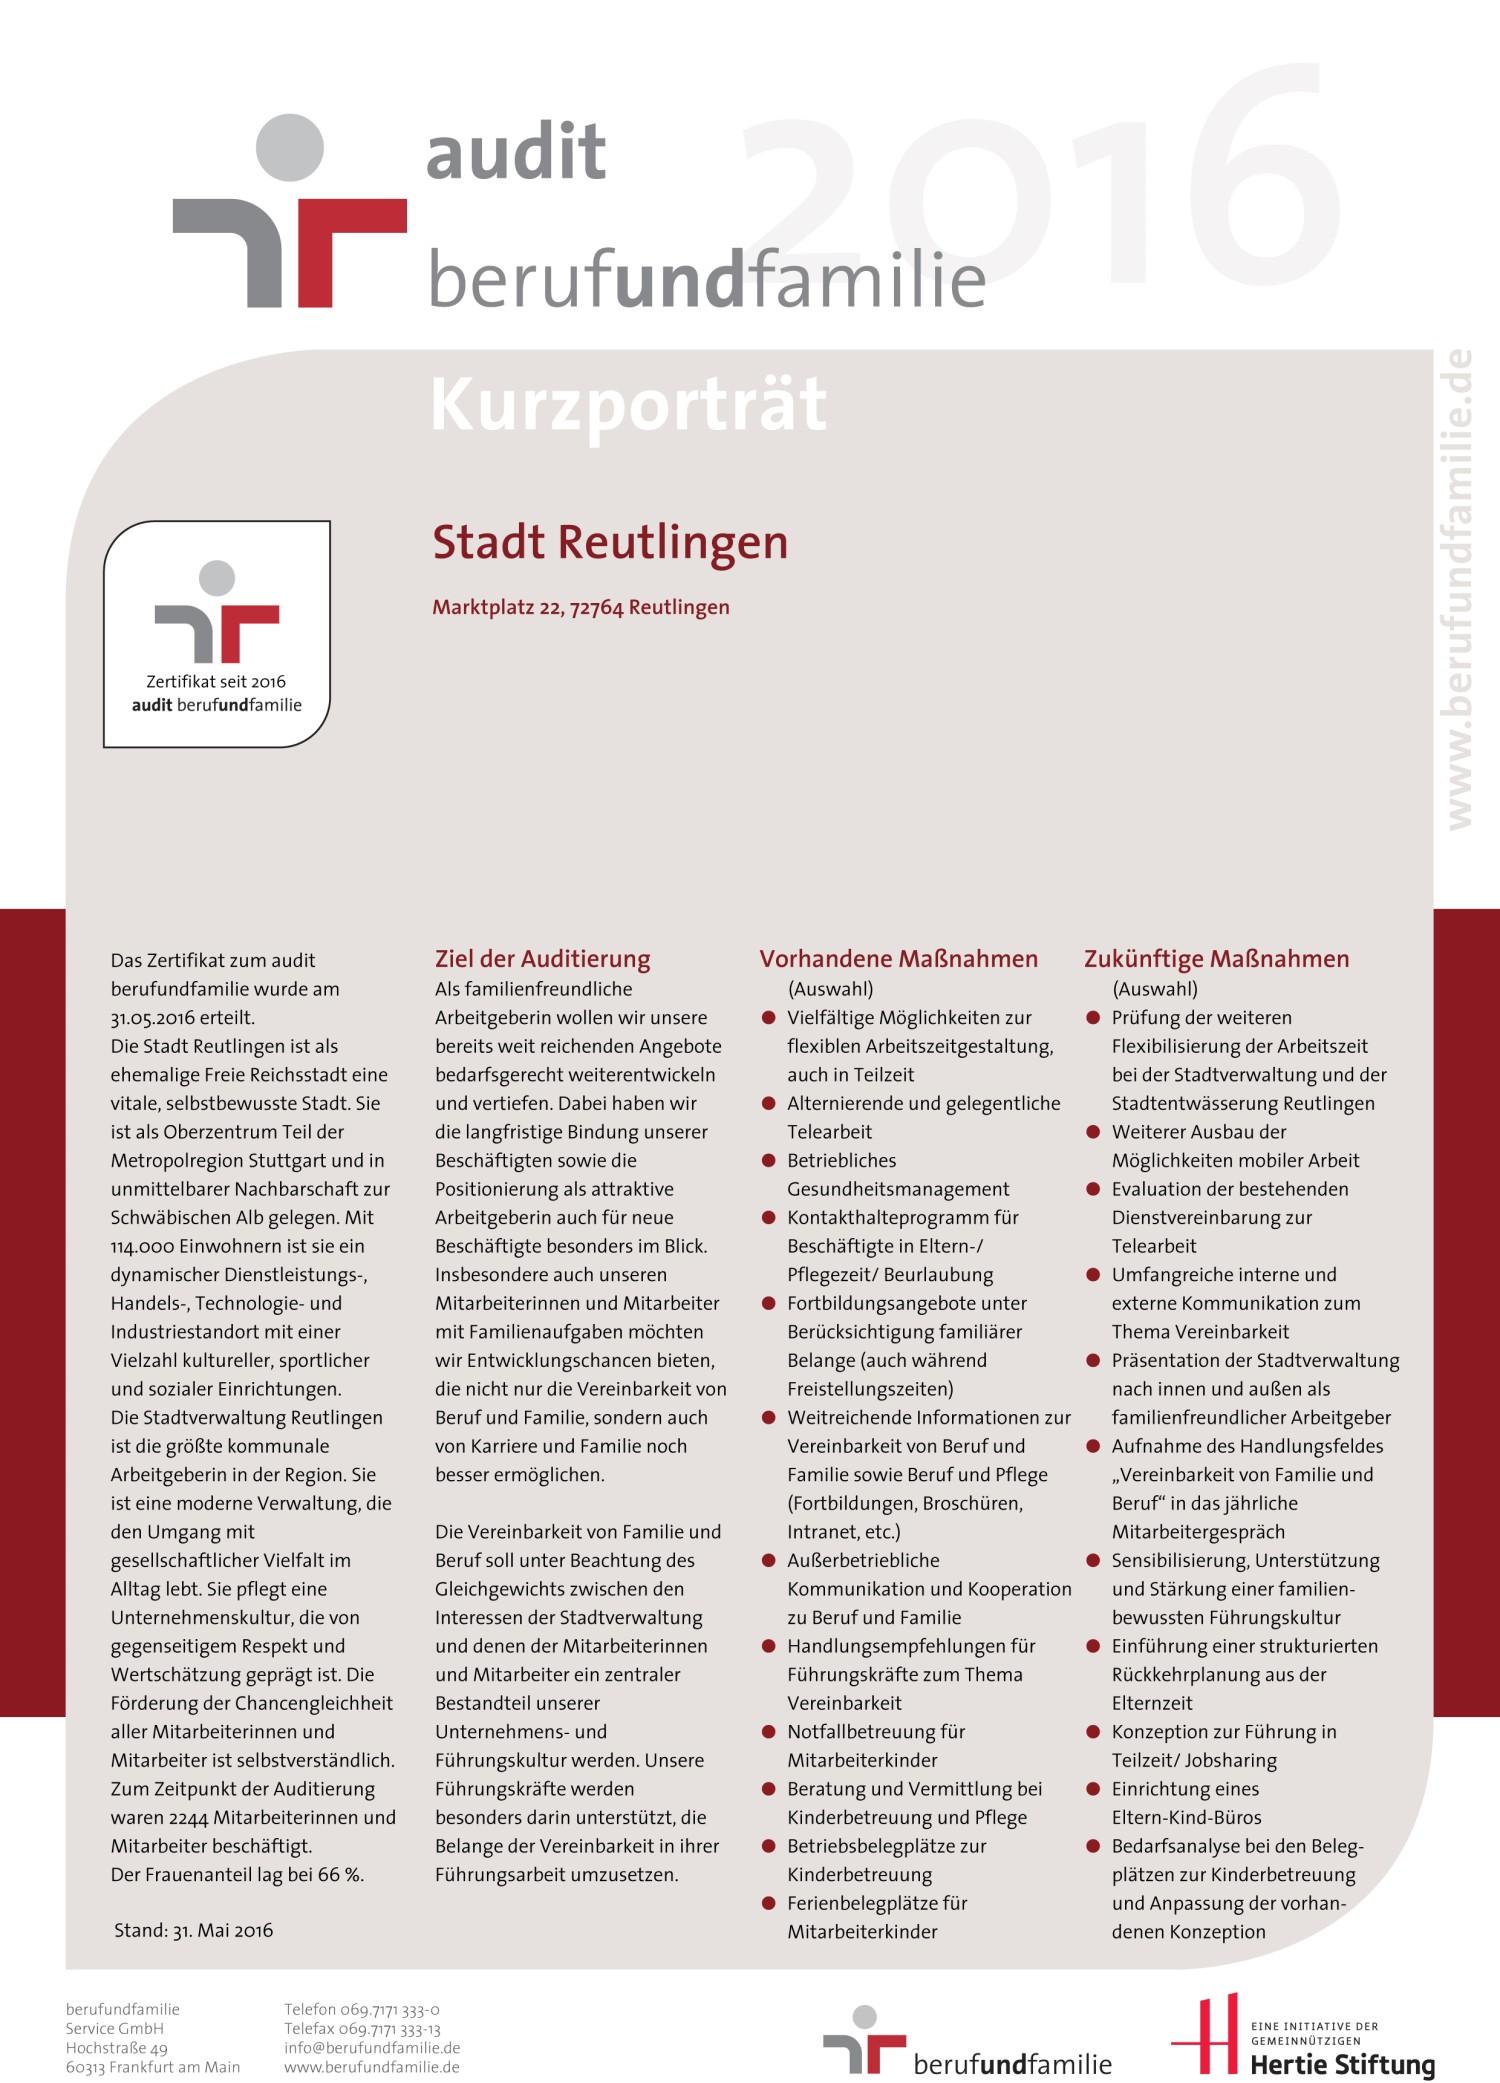 Kurzportrait Stadt Reutlingen Audit Beruf und Familie